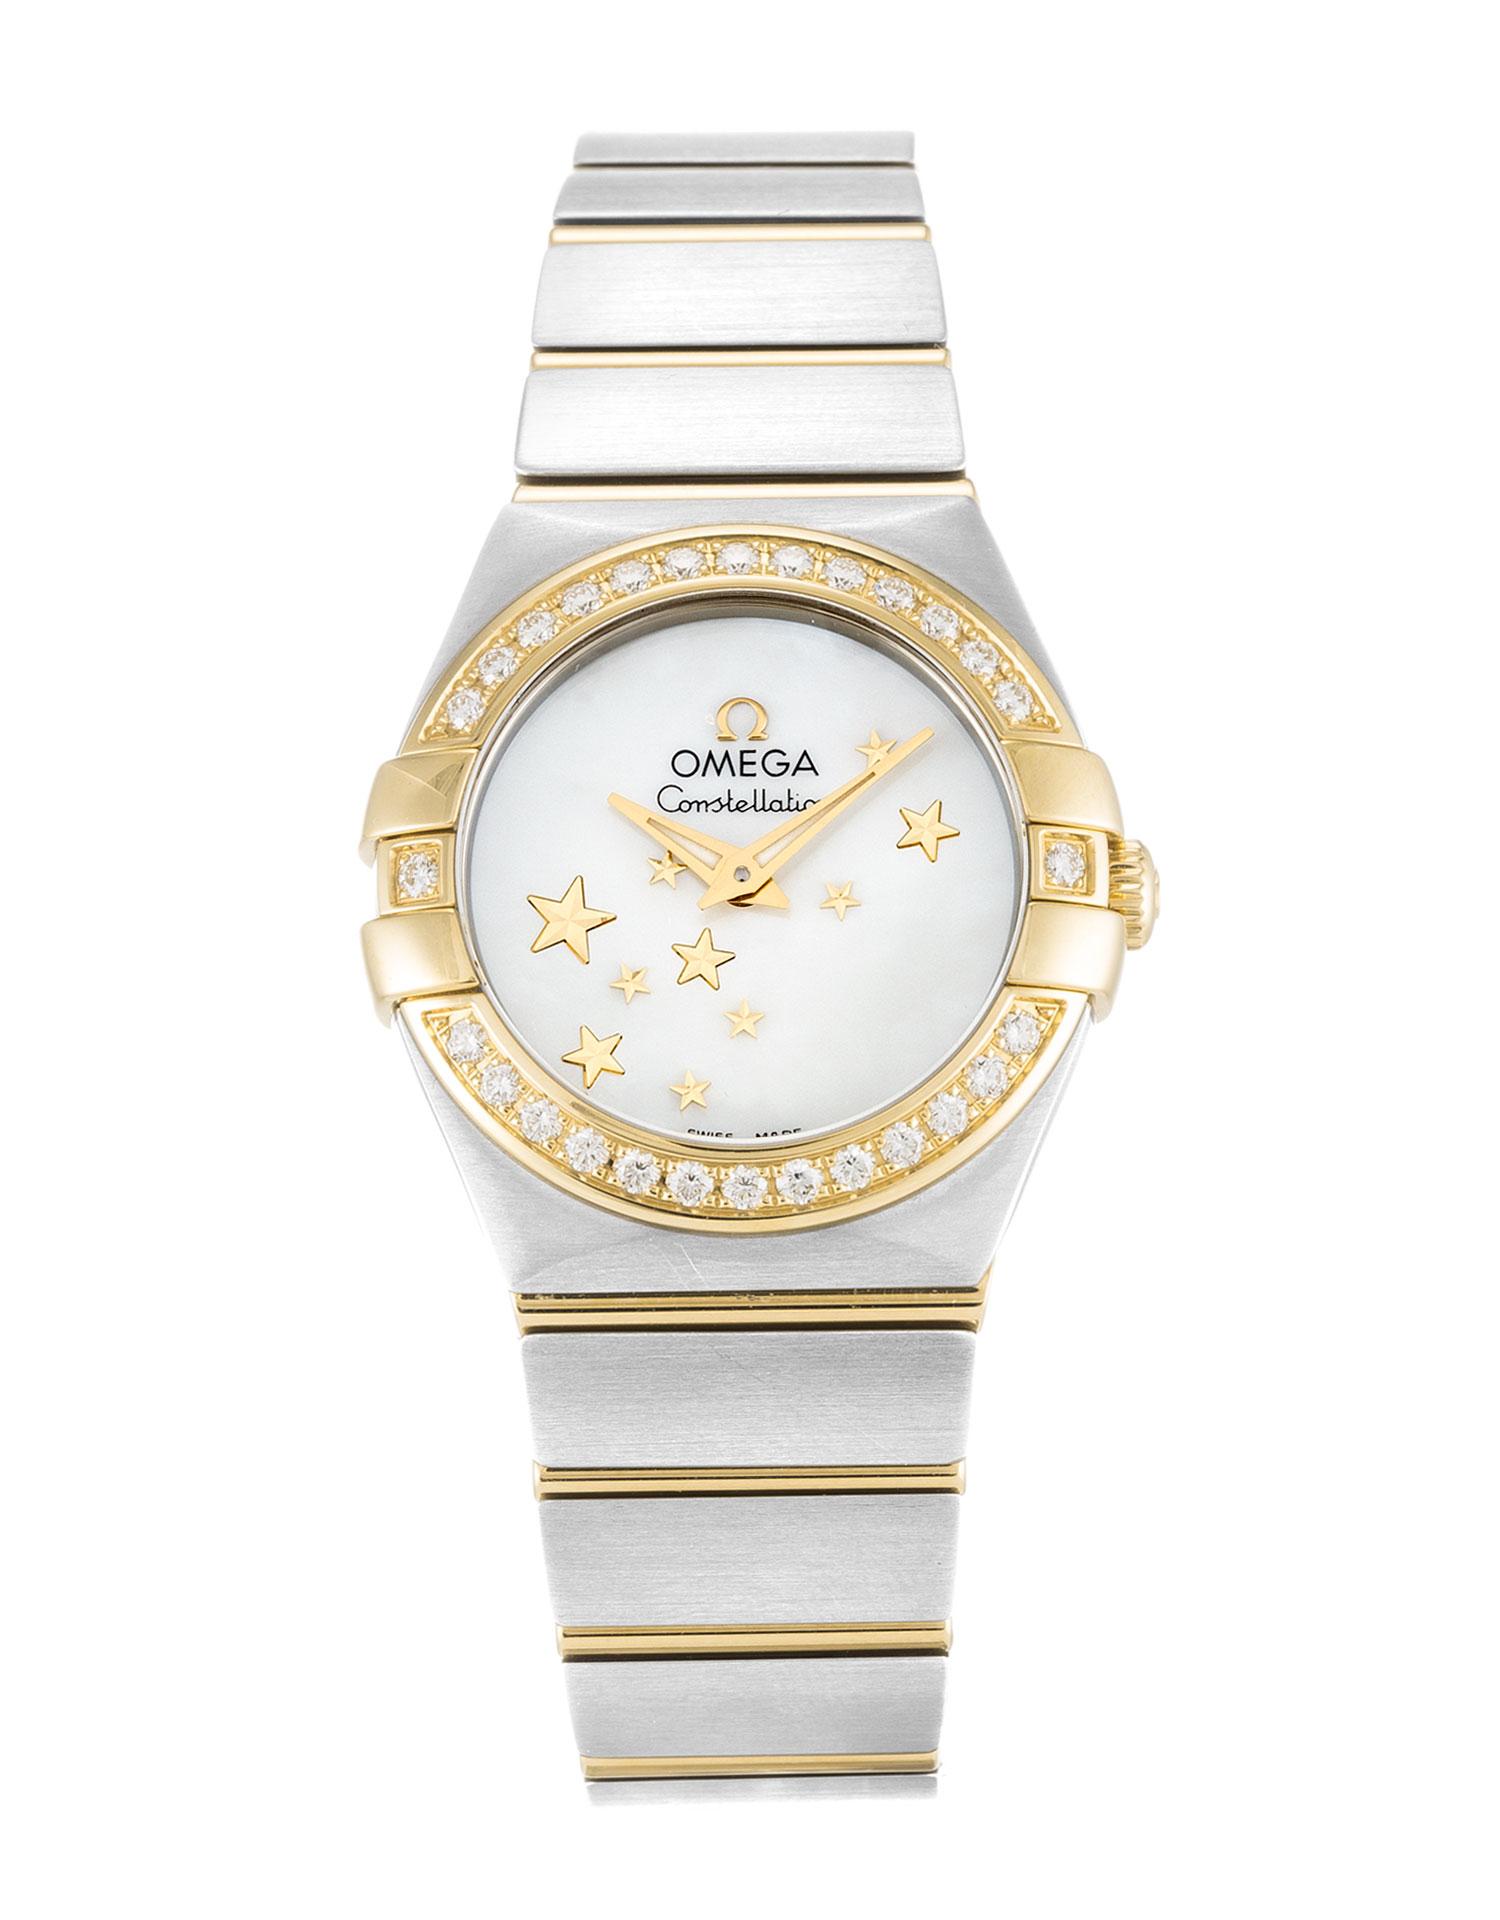 Omega Constellation Ladies 123.25.24.60.05.001 Ladies 24 Mm Steel & Yellow Gold Set With Diamonds Case Quartz Movement – iapac.to